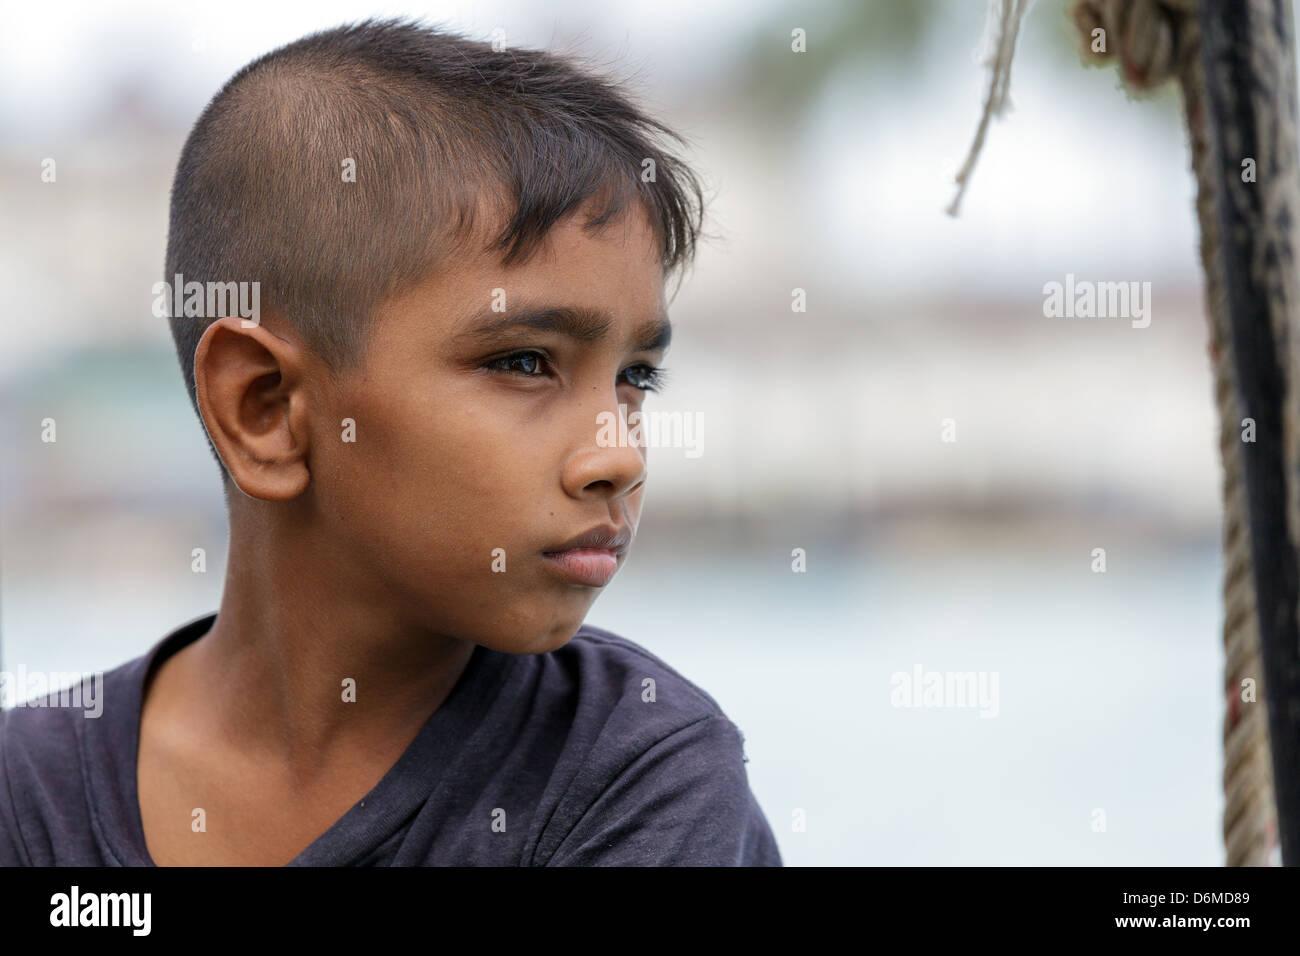 Boy thai ICLOUD LEAK pic 38